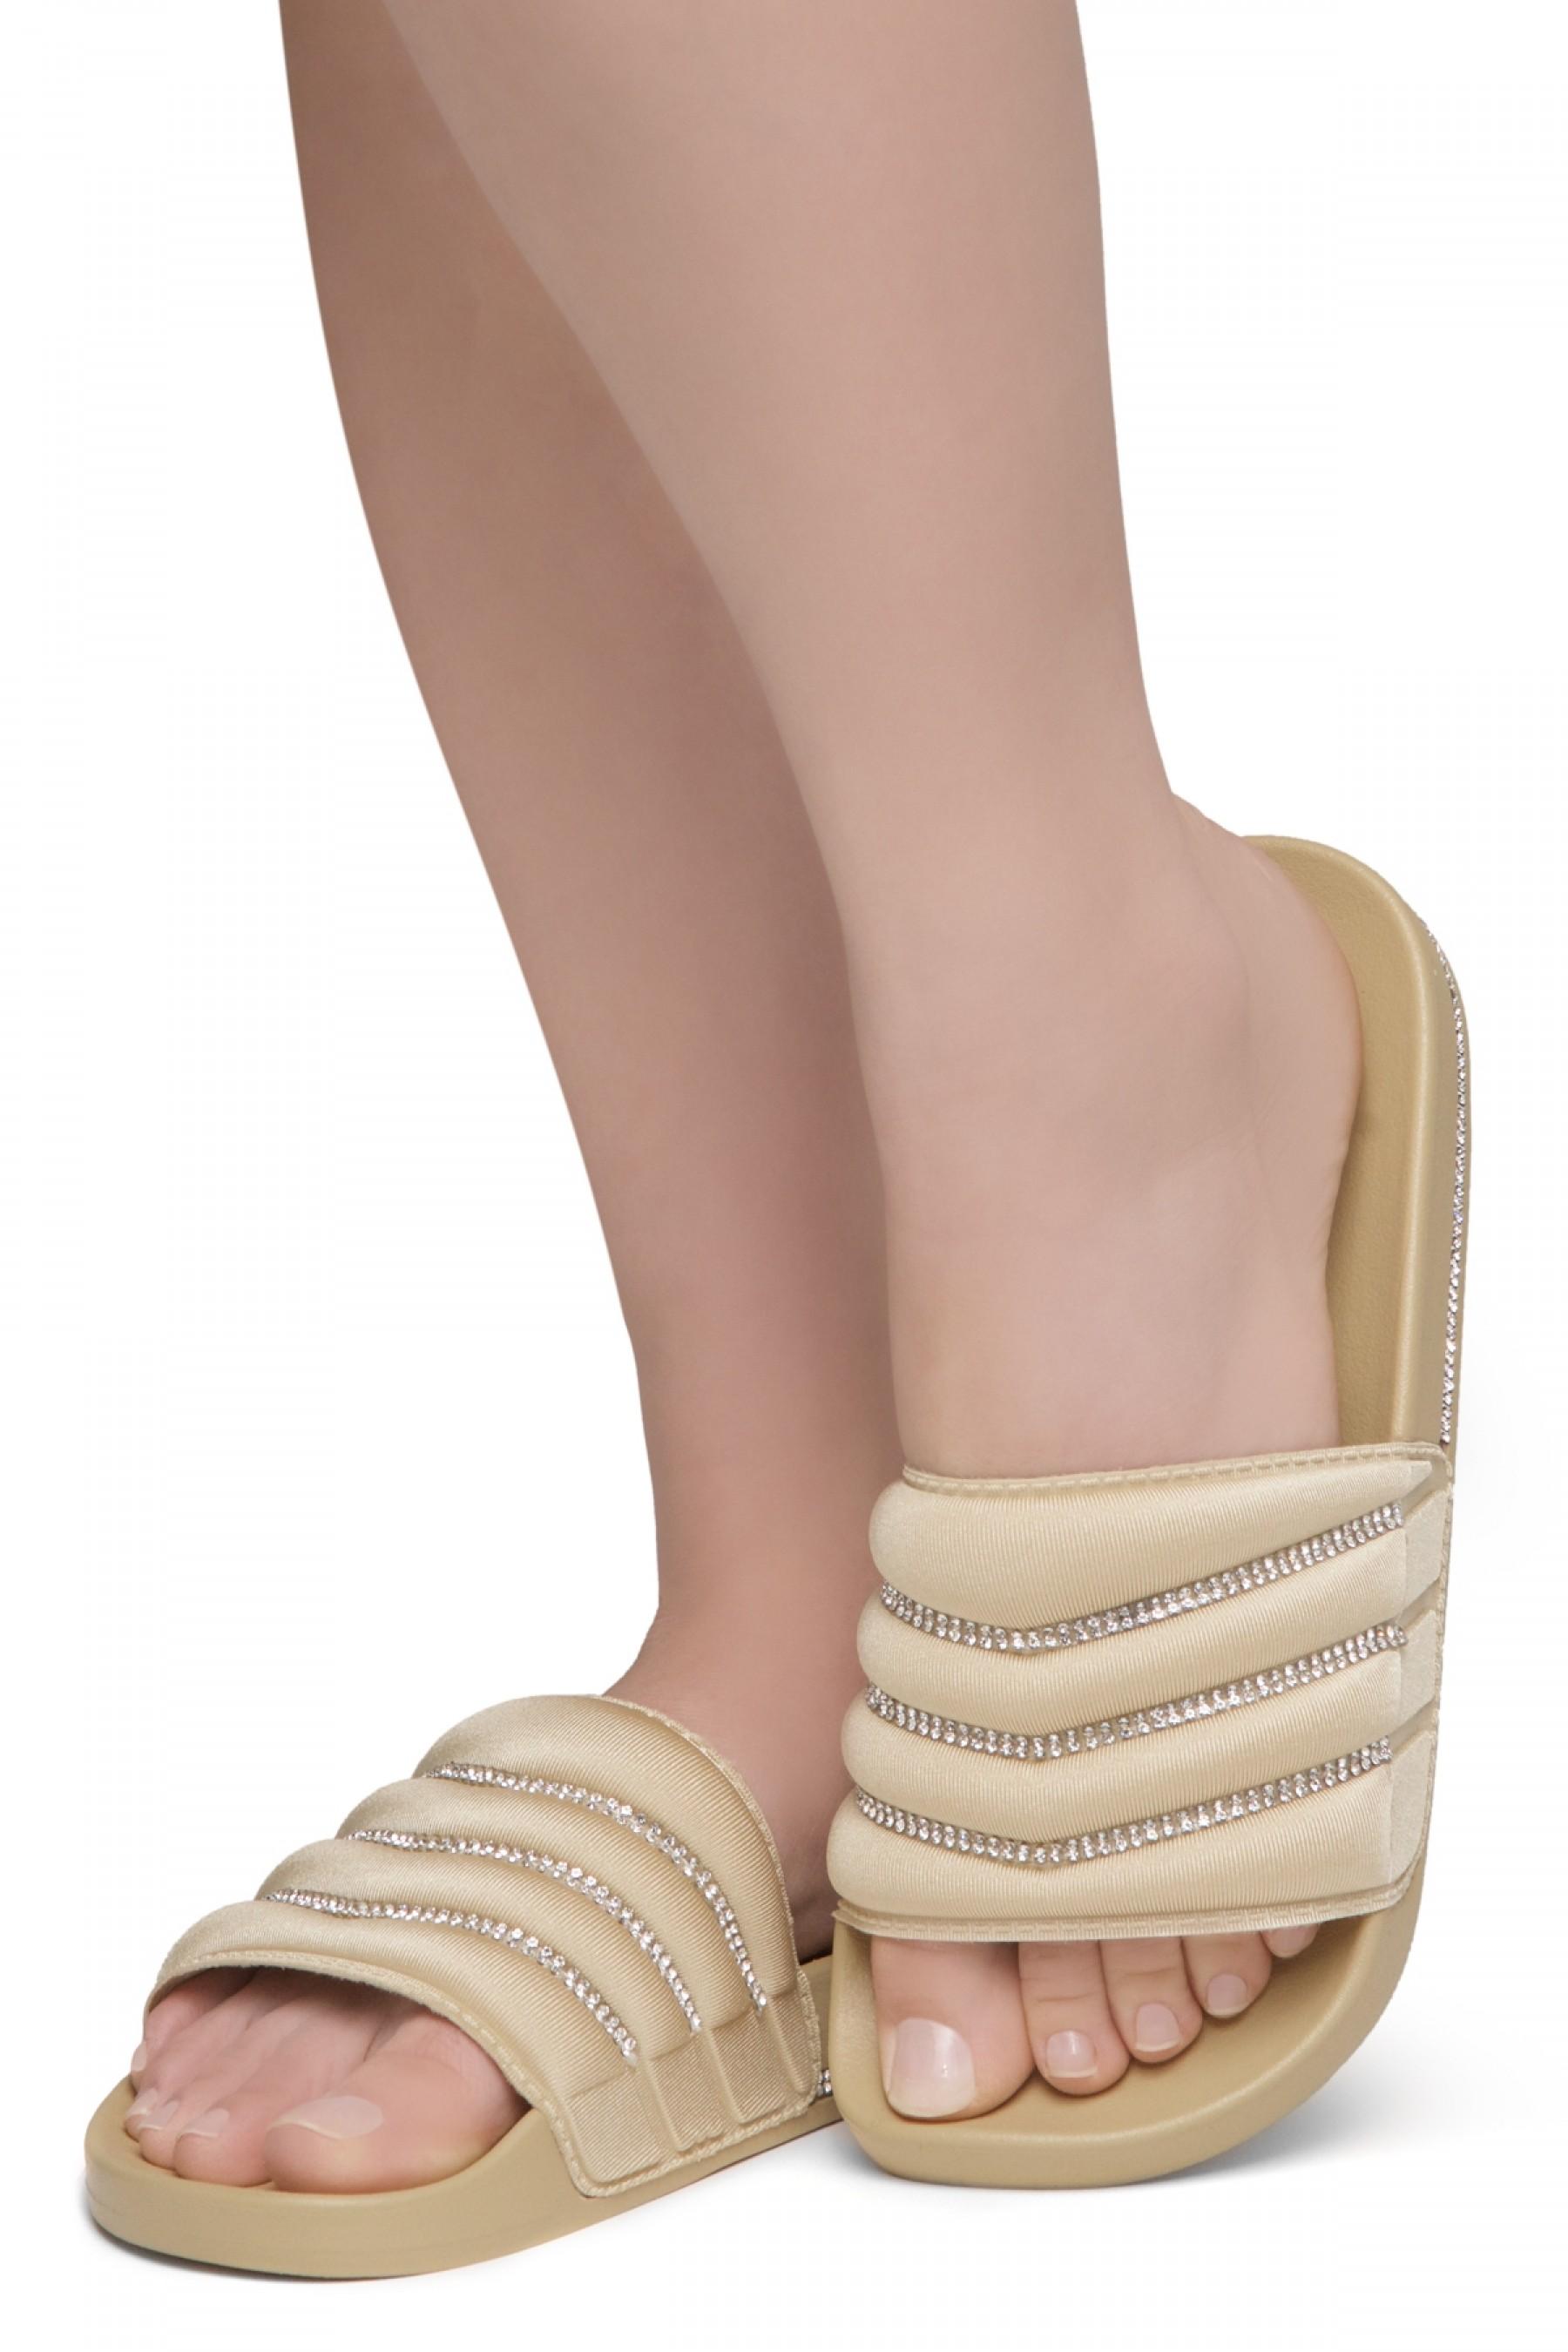 Shoe Land SL-Best Wishes-Women's Fashion Rhinestone Slide Slip On Summer Sandals (1901NUDE/NUDE)